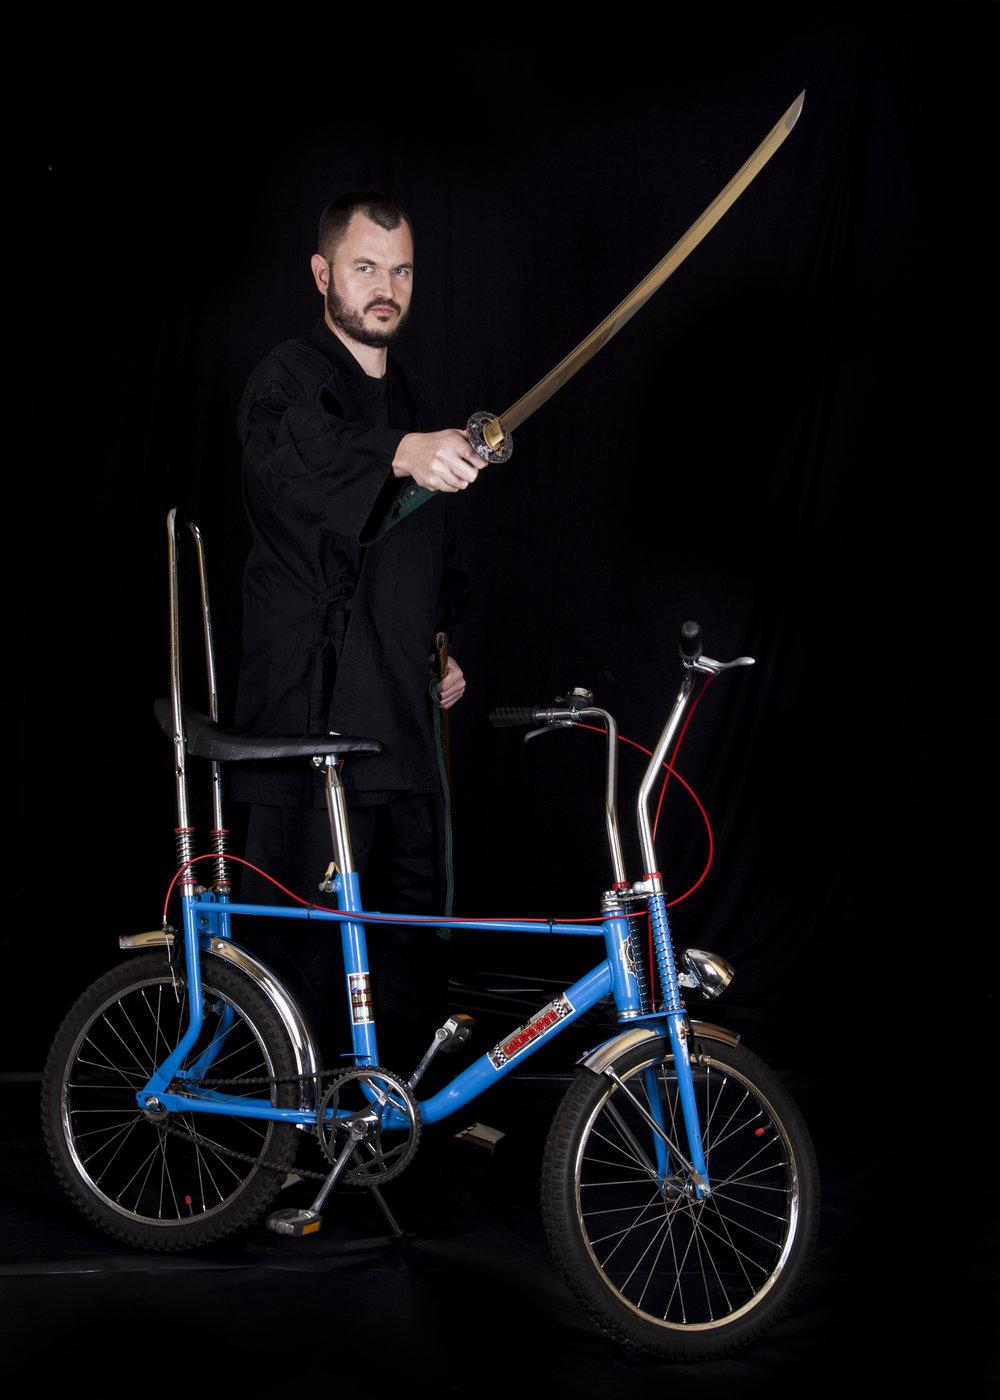 Alex Blumenberg - The Bike Ninja